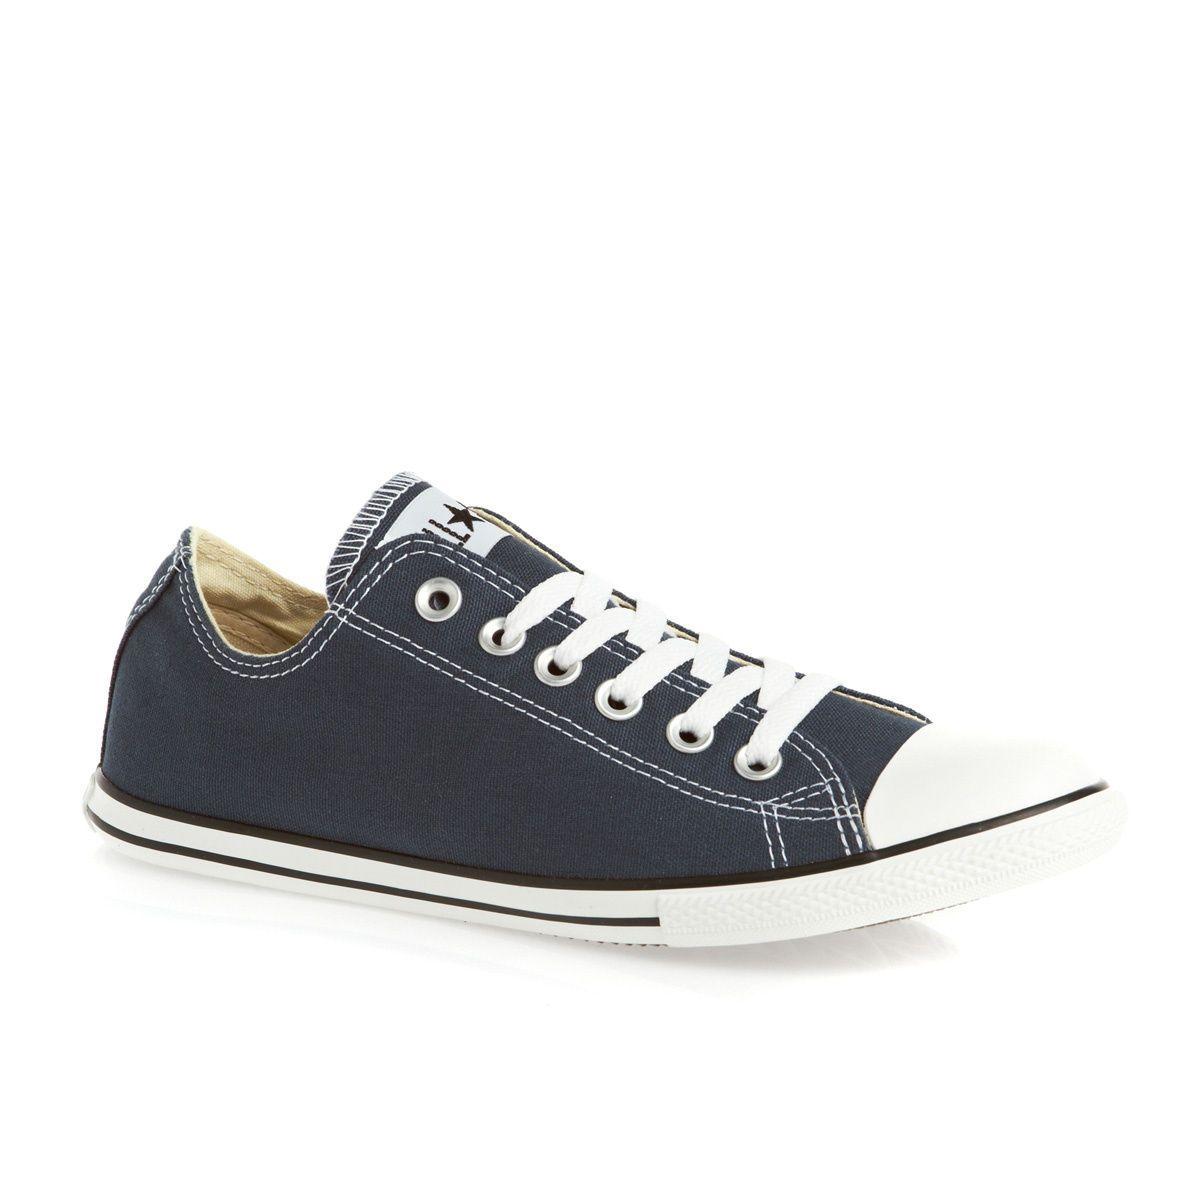 Converse slim, Converse, Shoes